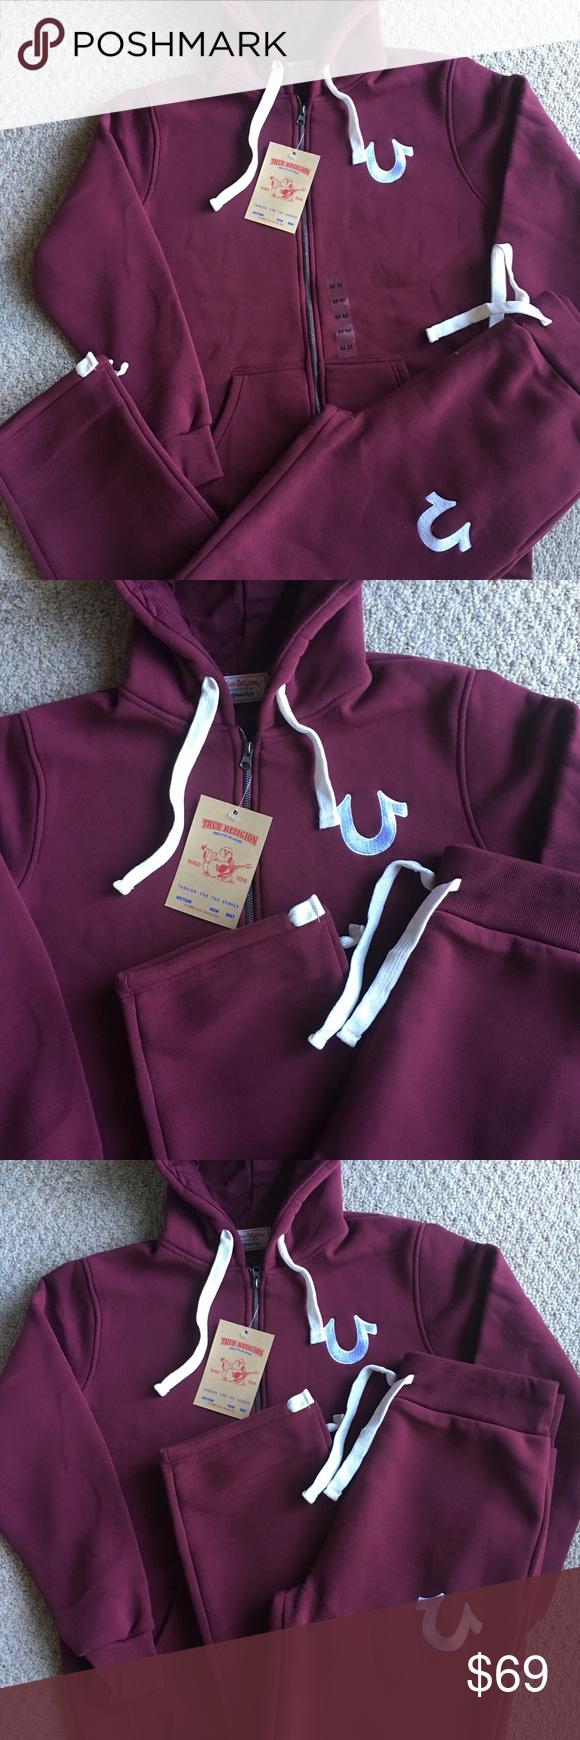 c848b155fc4b New Menu0026 39 s True Religion Zip Hoodie Sweatpants Set